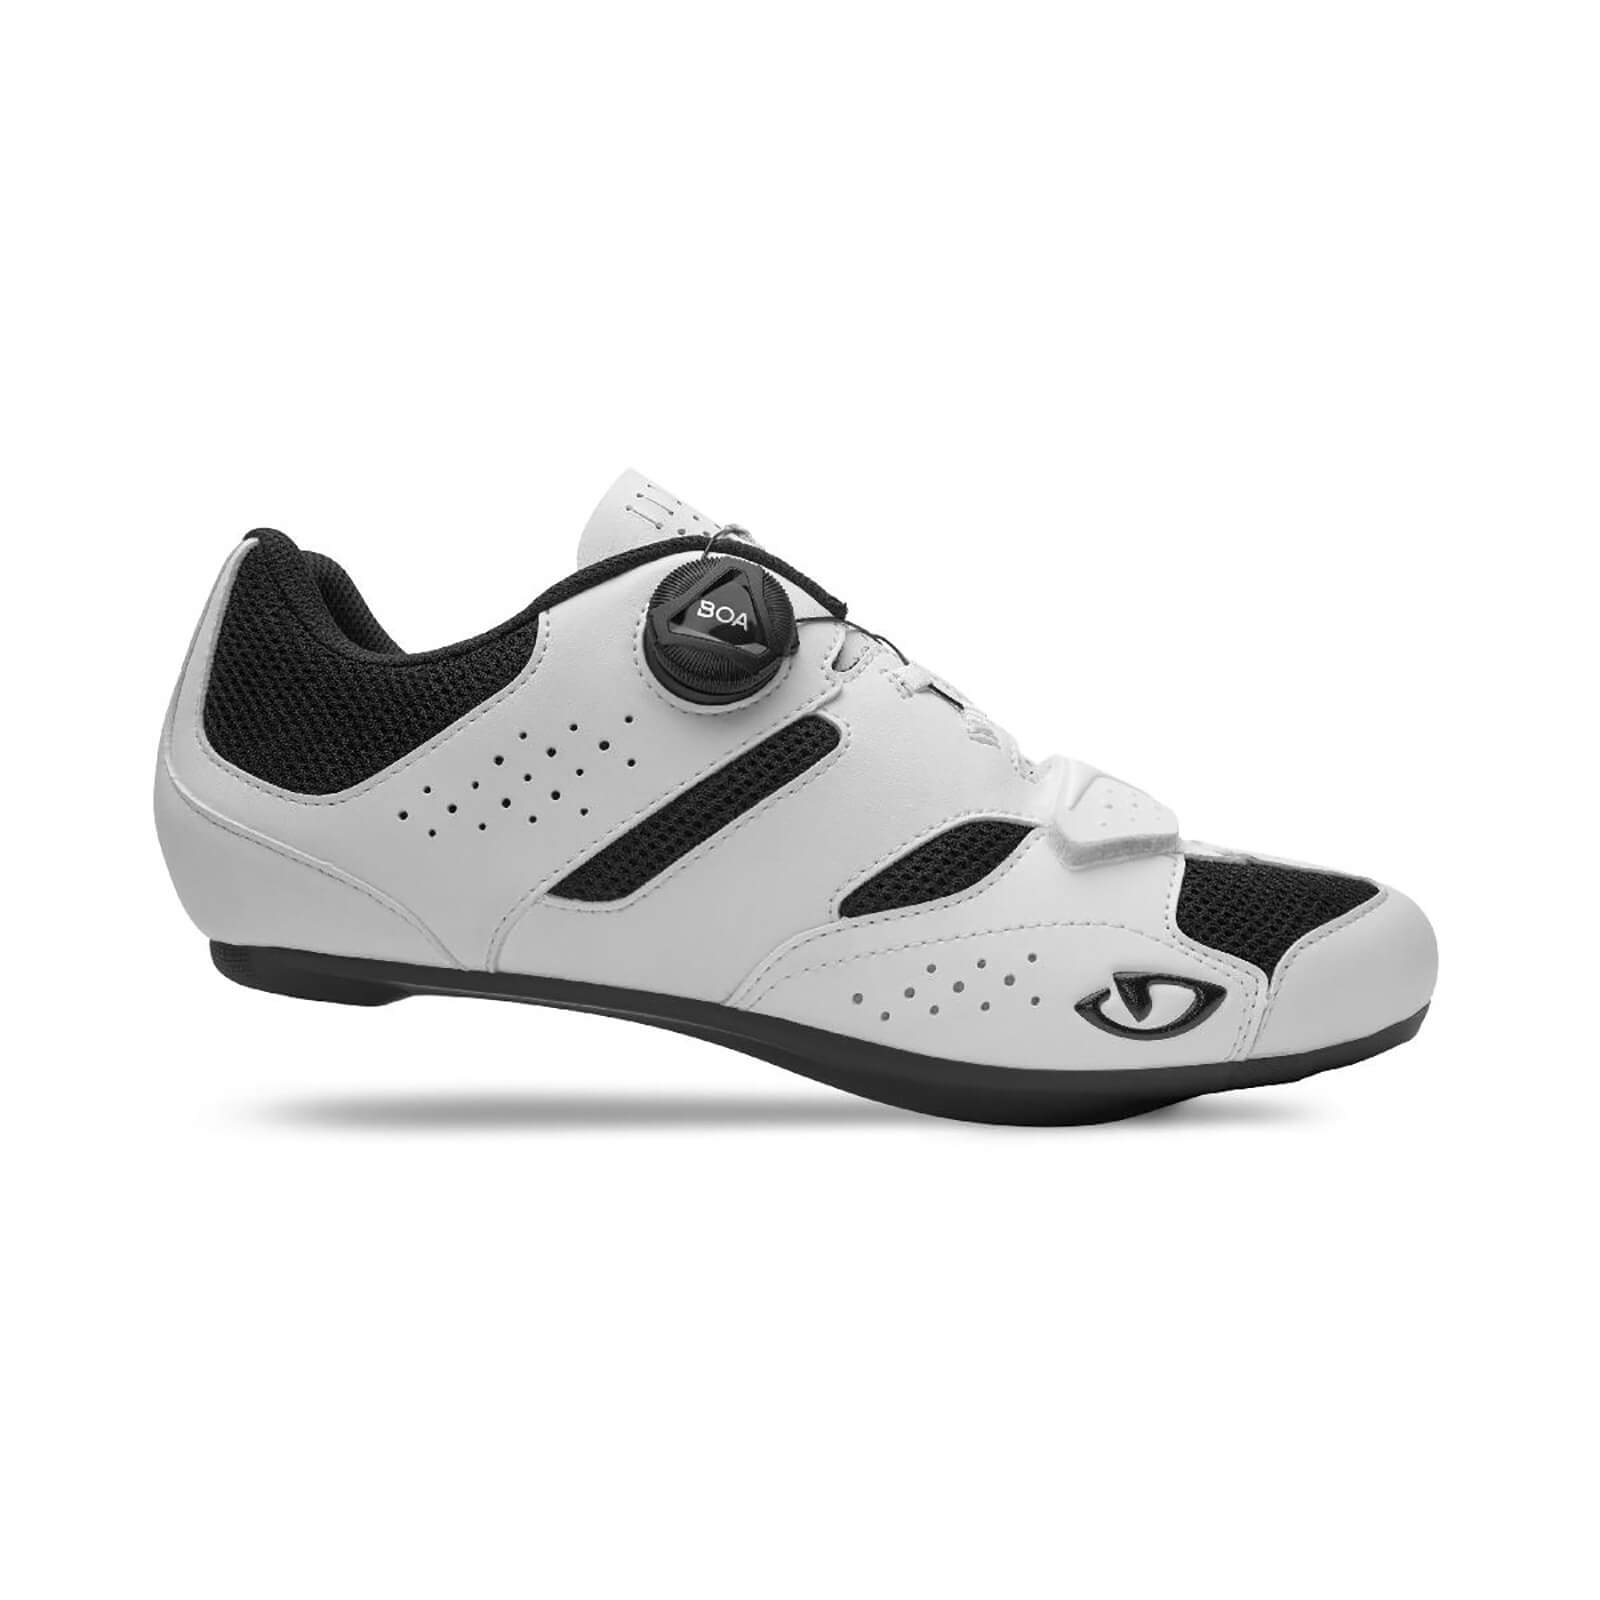 Hjc Valeco Road Helmet - M - Matt Gloss Off White